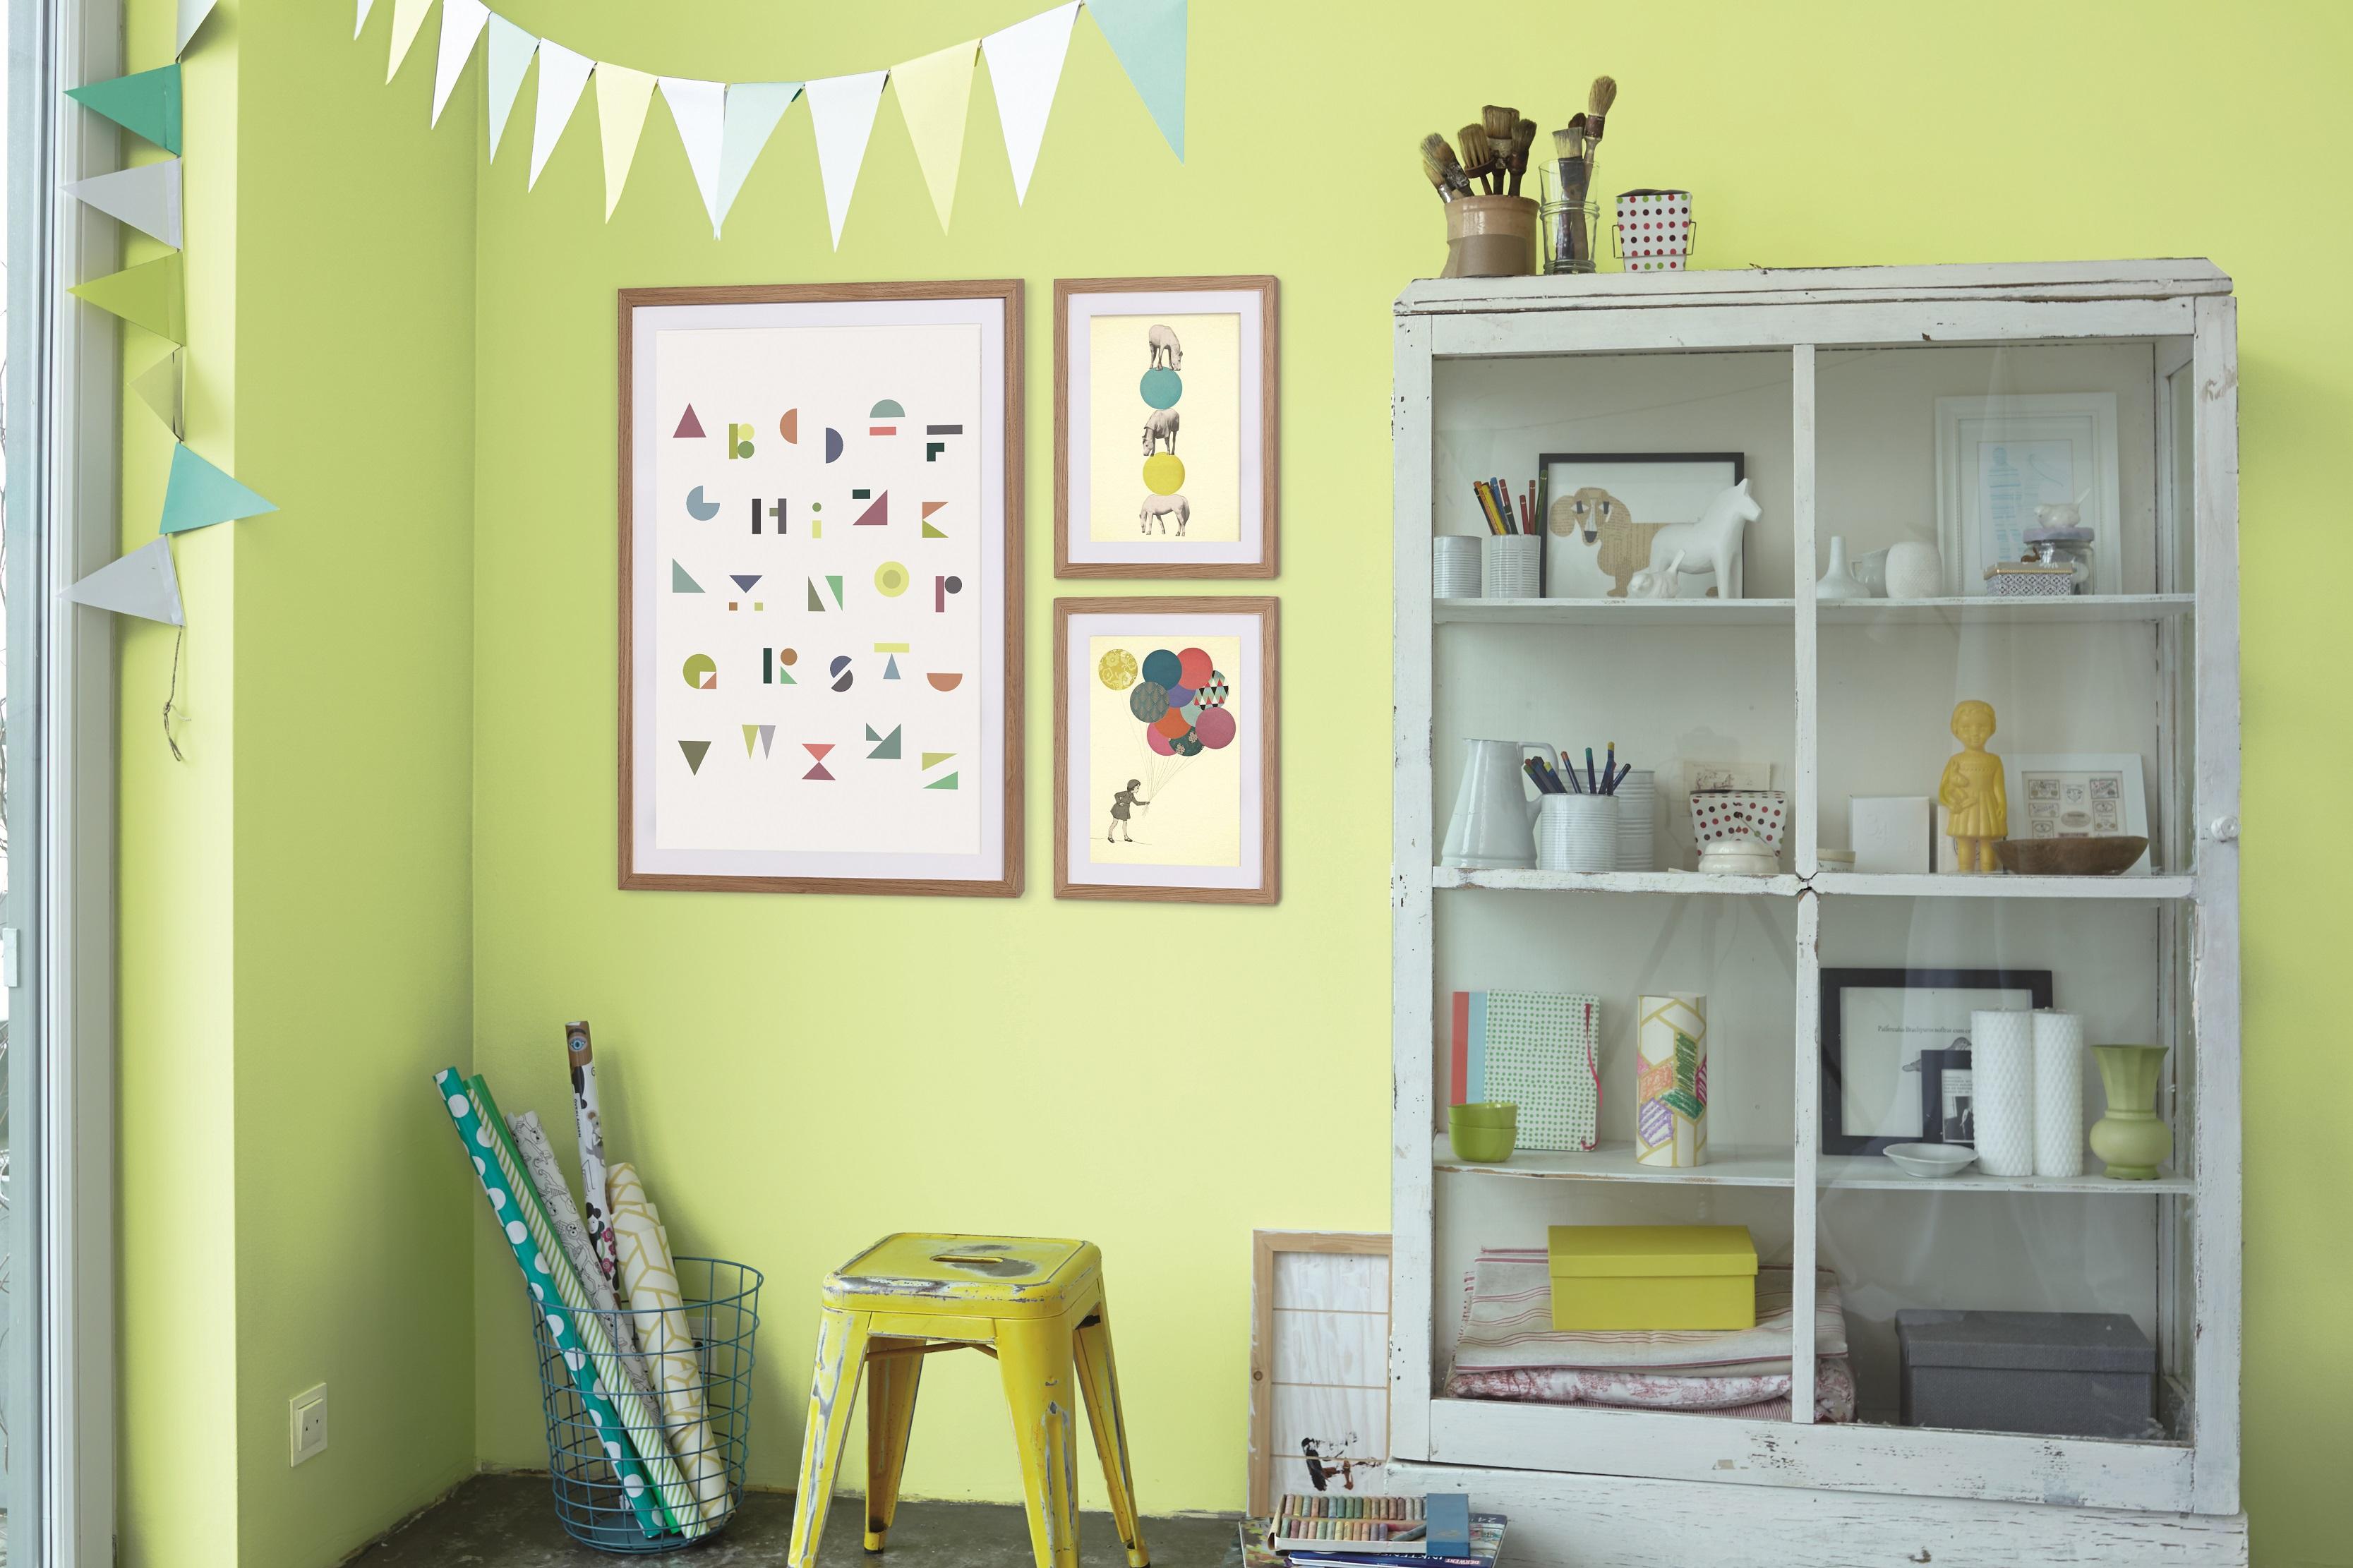 kunst und farbe individuell kombinieren alpina farbe. Black Bedroom Furniture Sets. Home Design Ideas